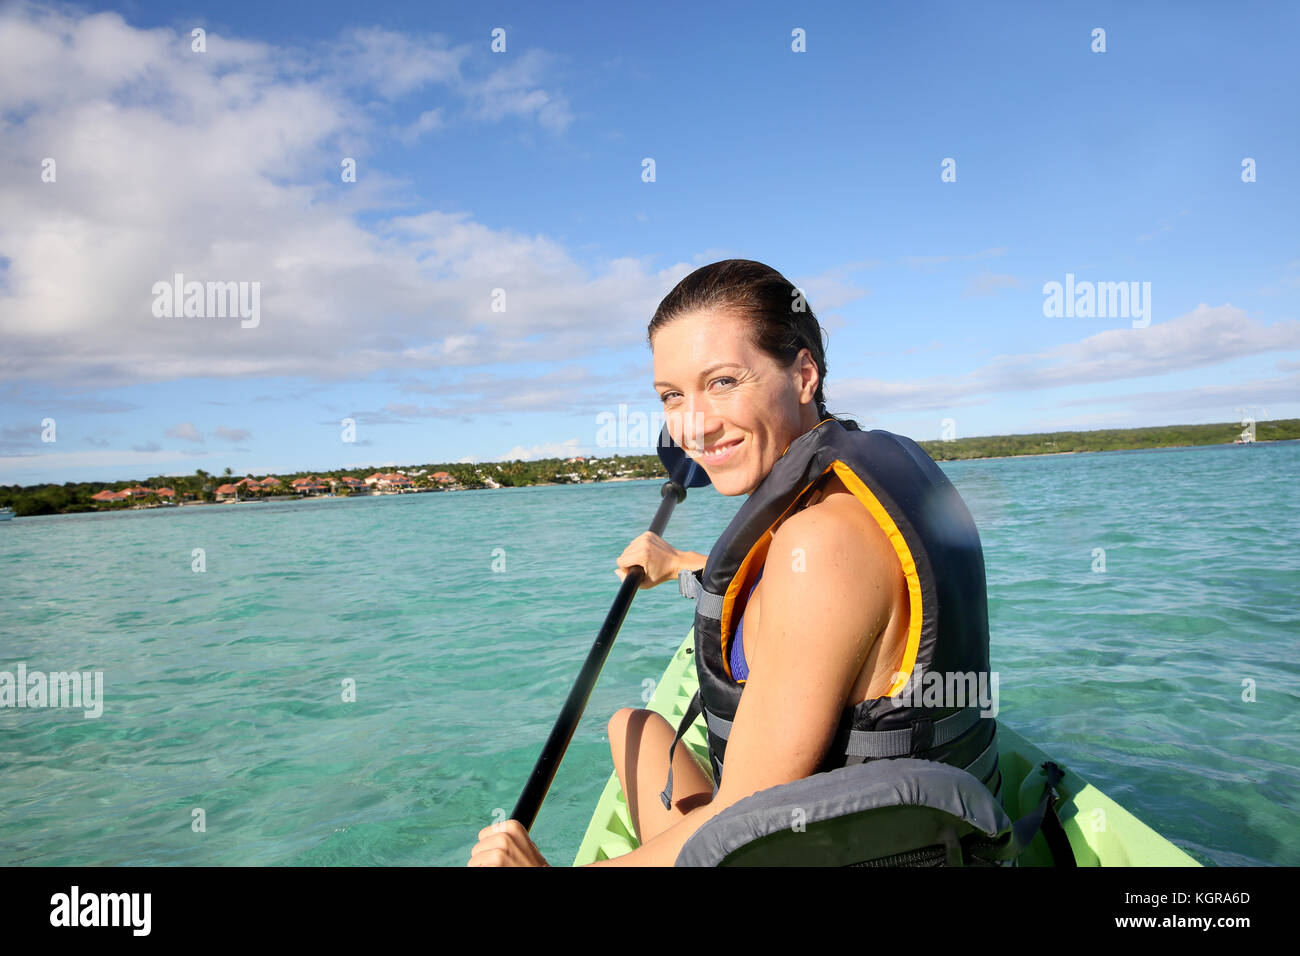 Woman paddling in canoe on blue lagoon - Stock Image